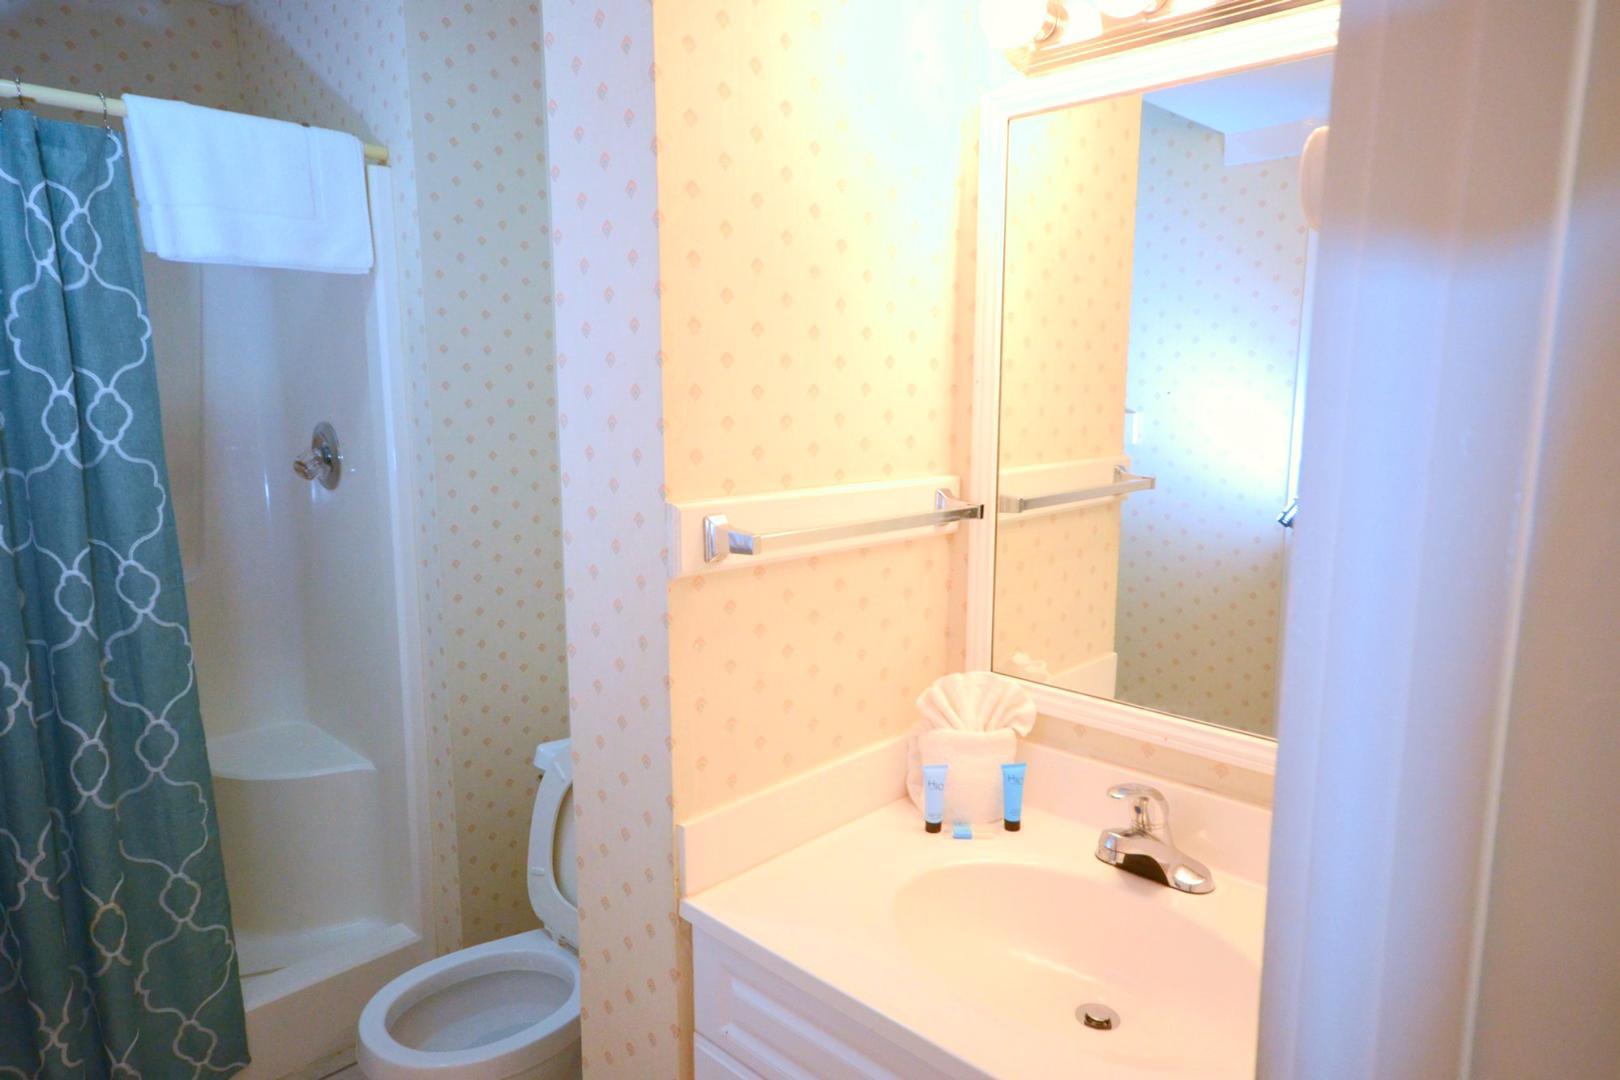 Ocean Creek L2256 - Bathroom 1